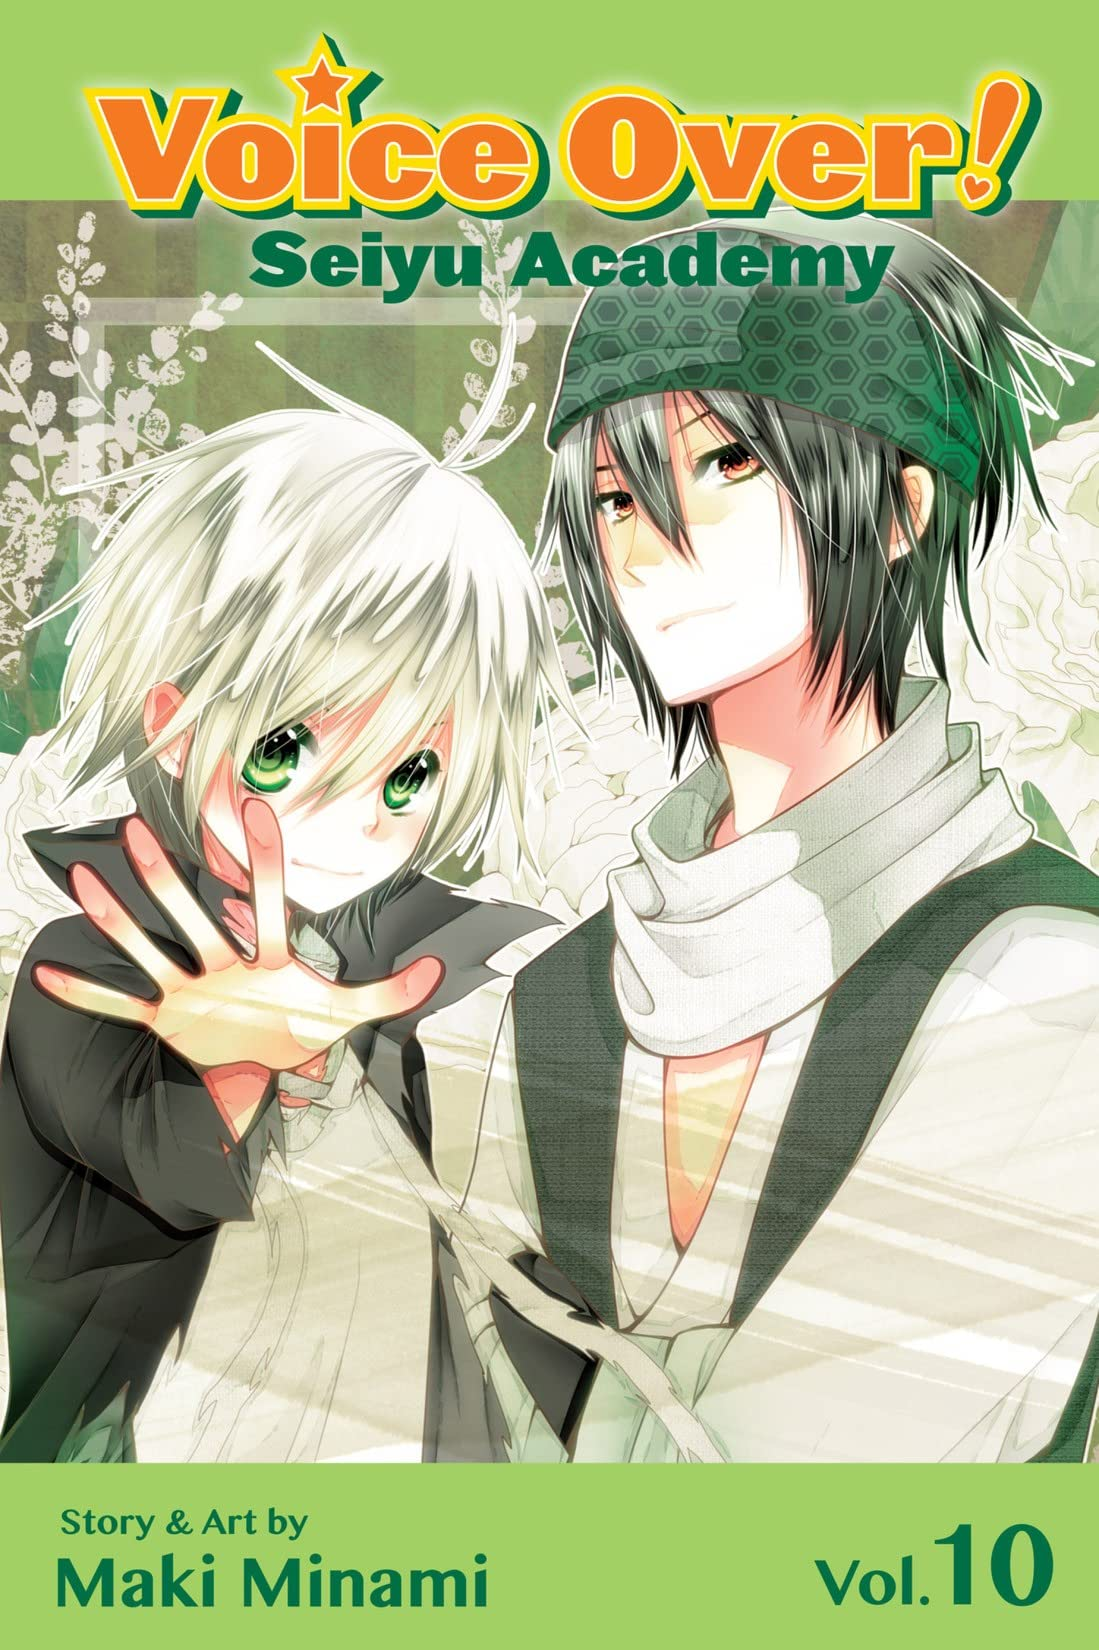 Voice Over!: Seiyu Academy Vol. 10